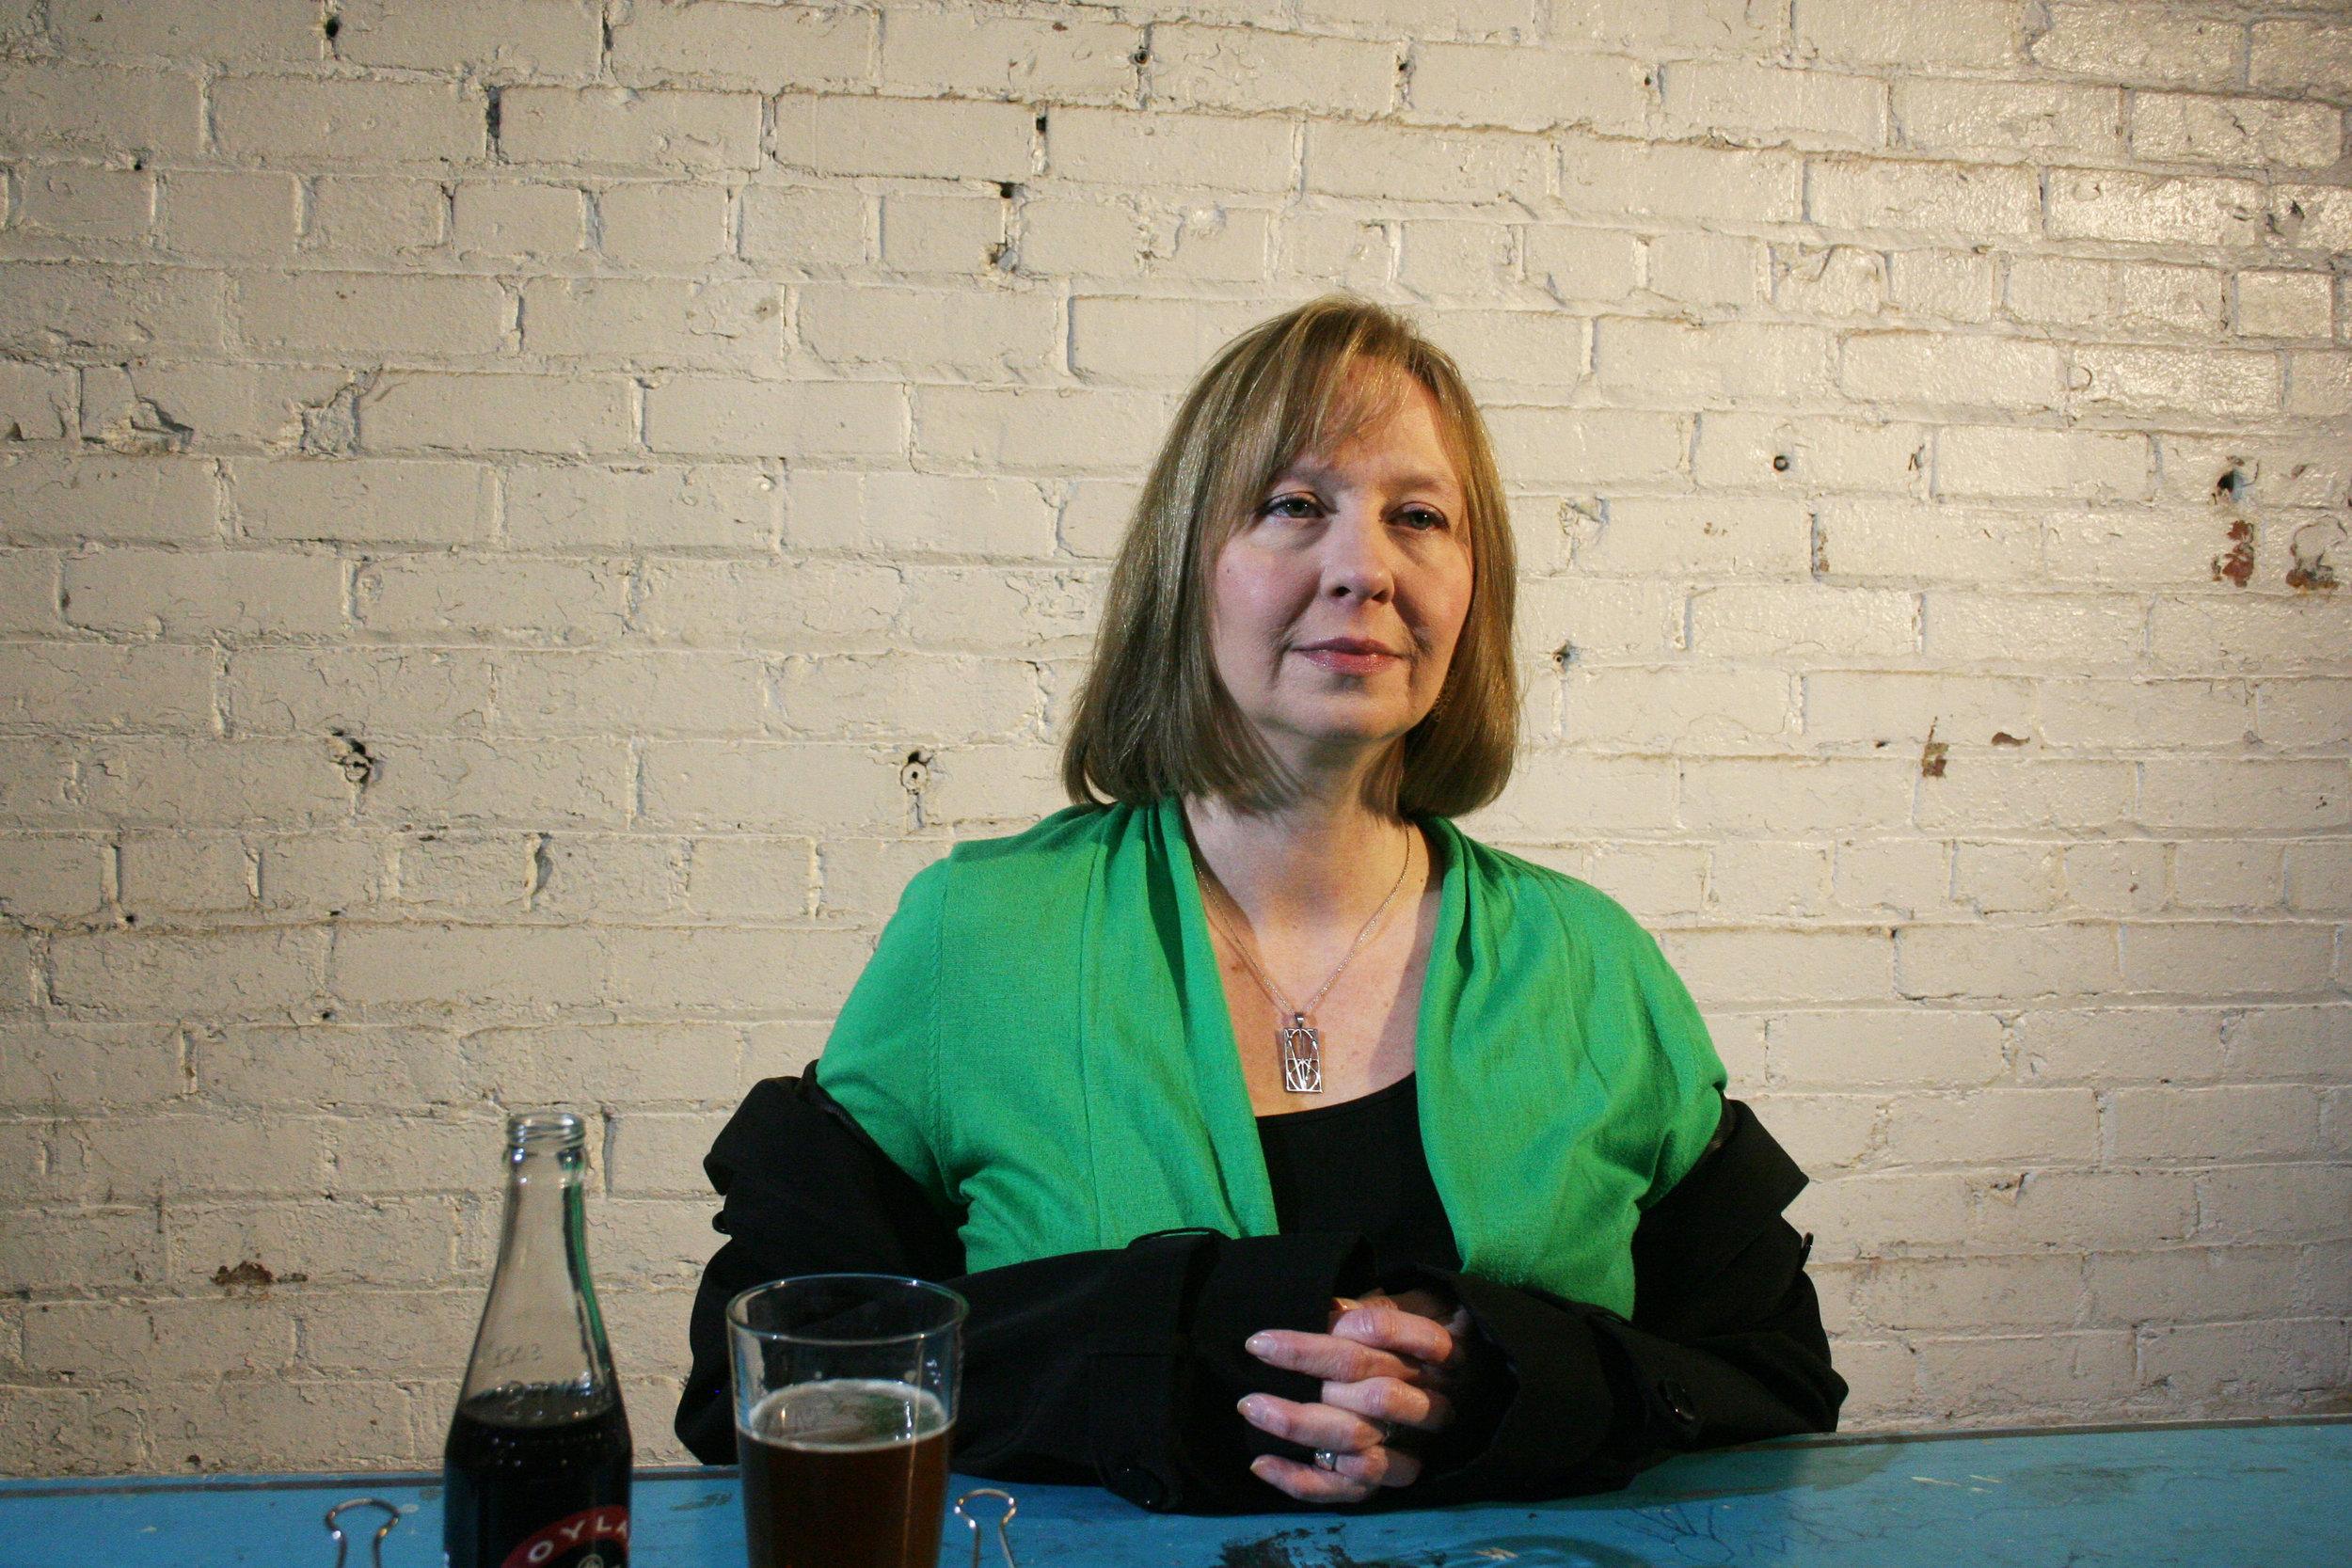 Robyn Abbott at Forest City Brewery 3-9-18.jpg